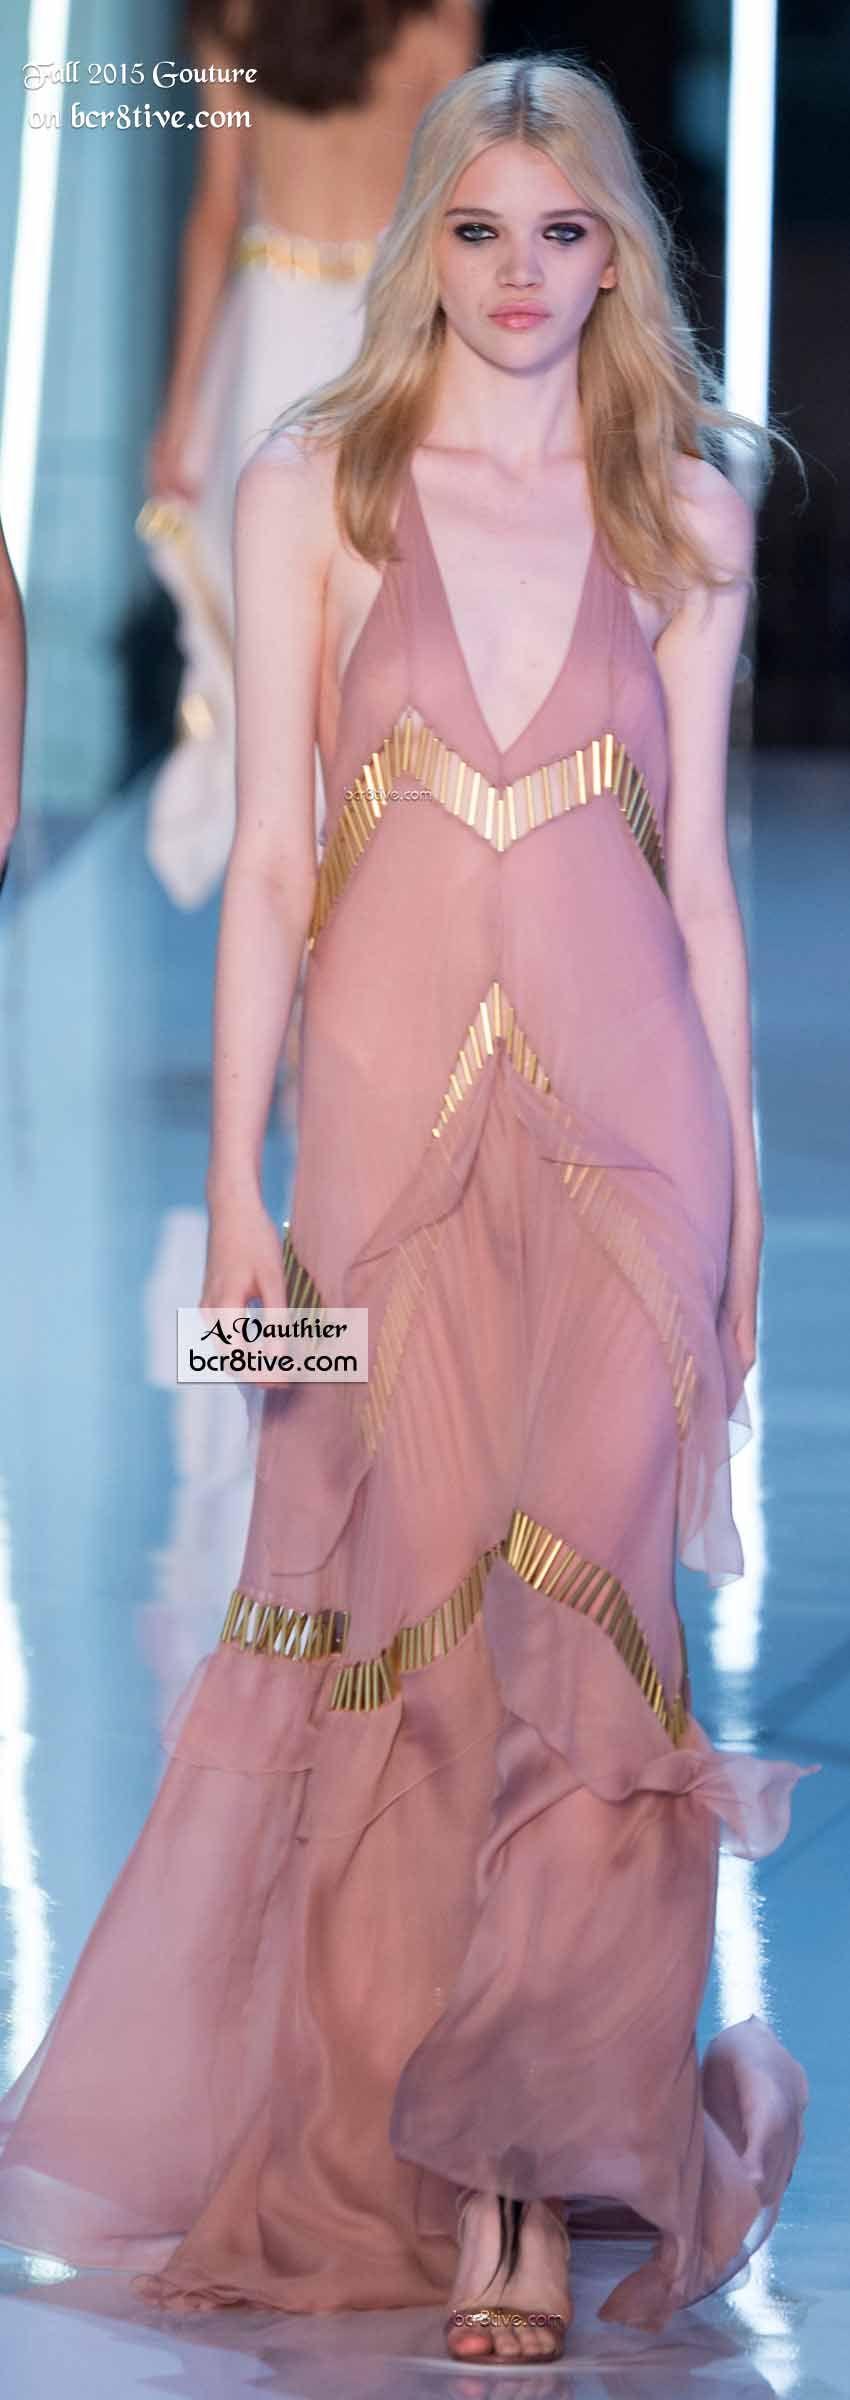 The Best Haute Couture Fashion of Fall 2015-16 | Alta costura ...